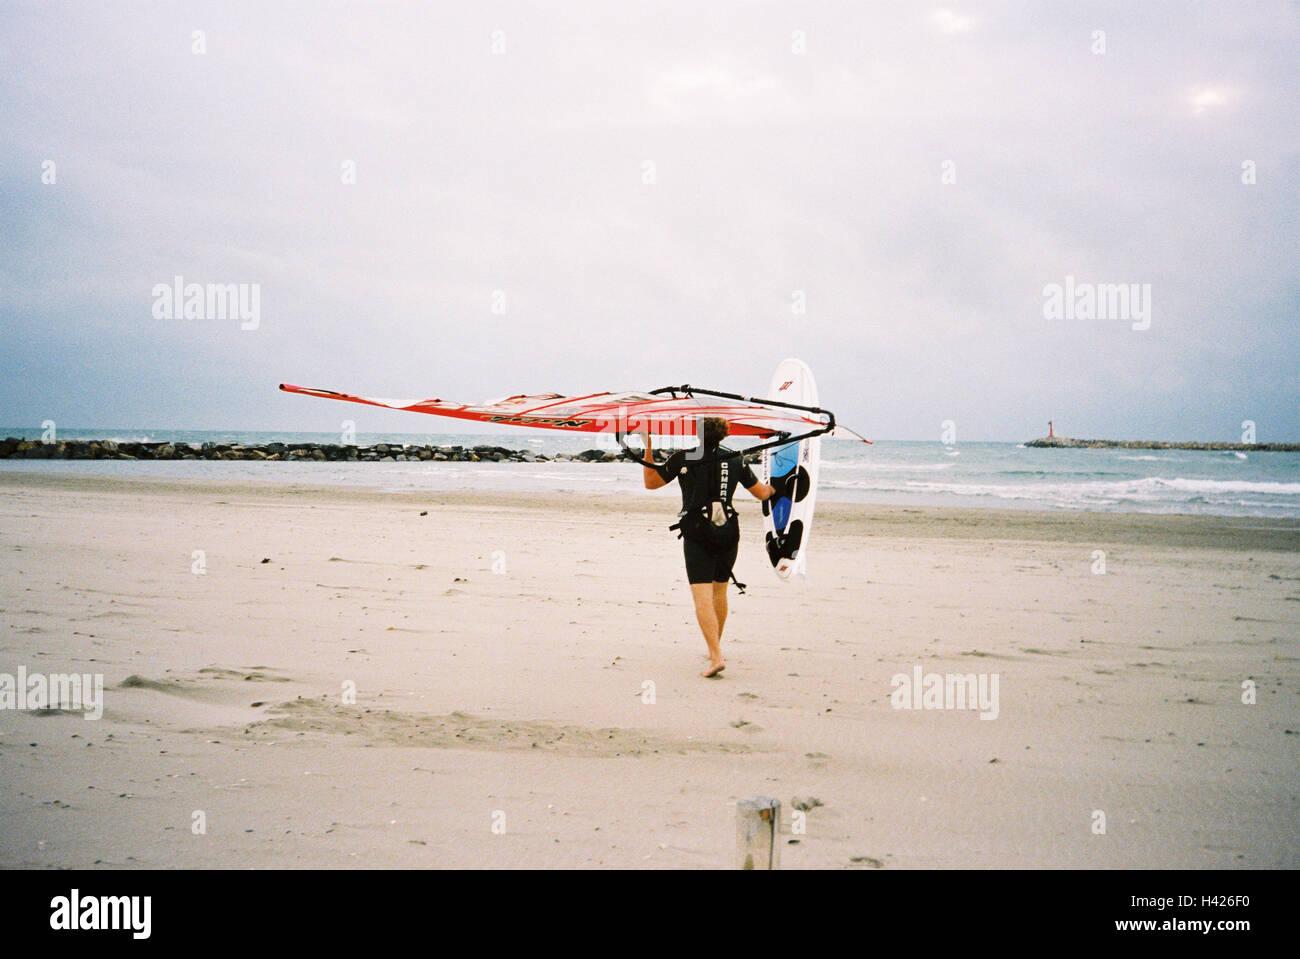 Man, surfboard, beach, carries,  Move opinion,   France, St. Marie of de la Mer, sea, windsurfers, Speedsurfer, - Stock Image